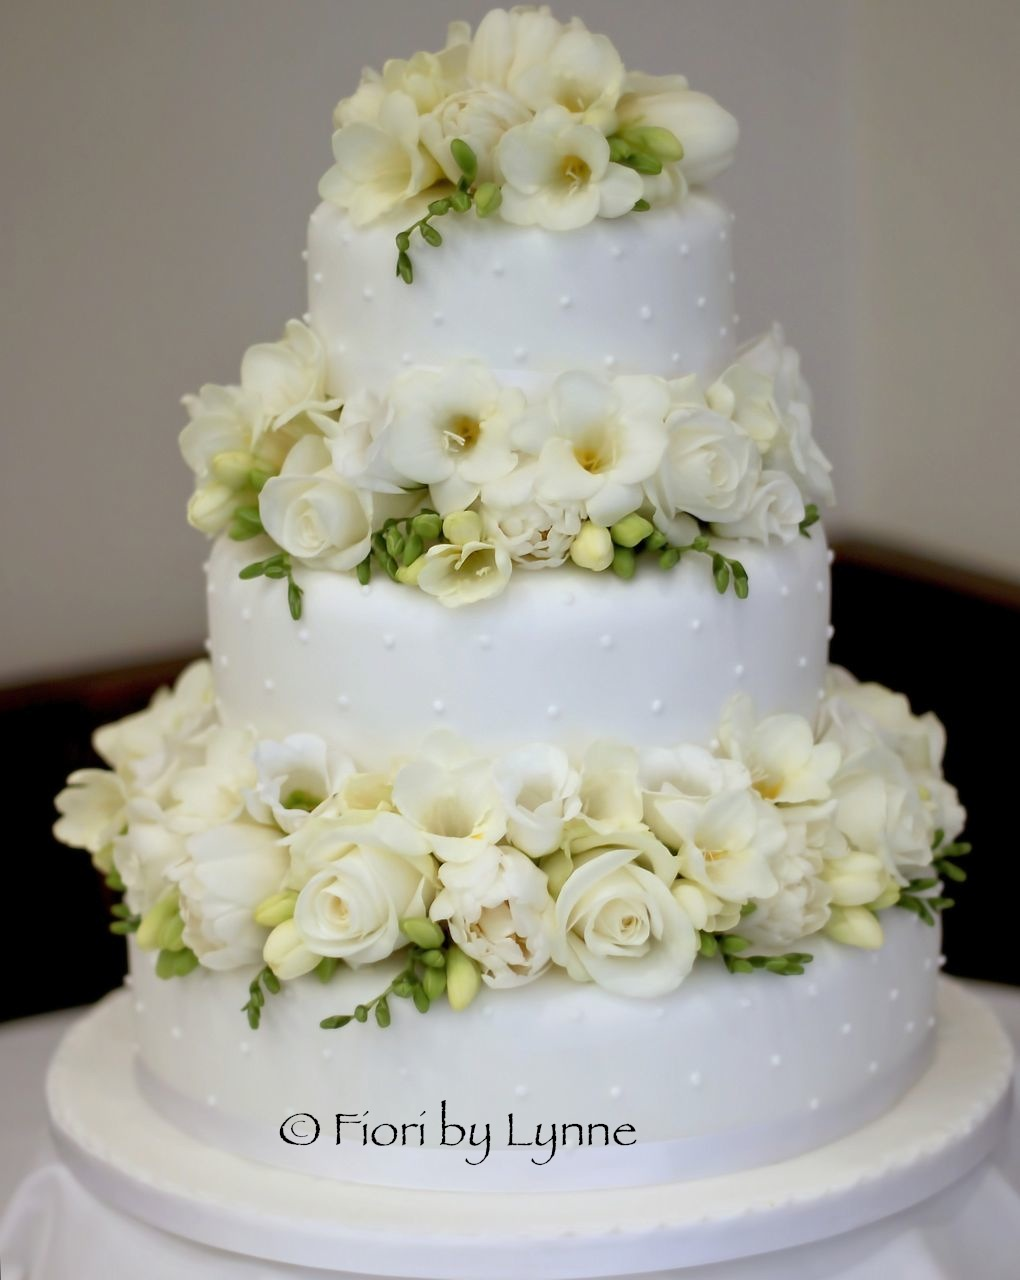 Wedding Cake With Roses Between Tiers